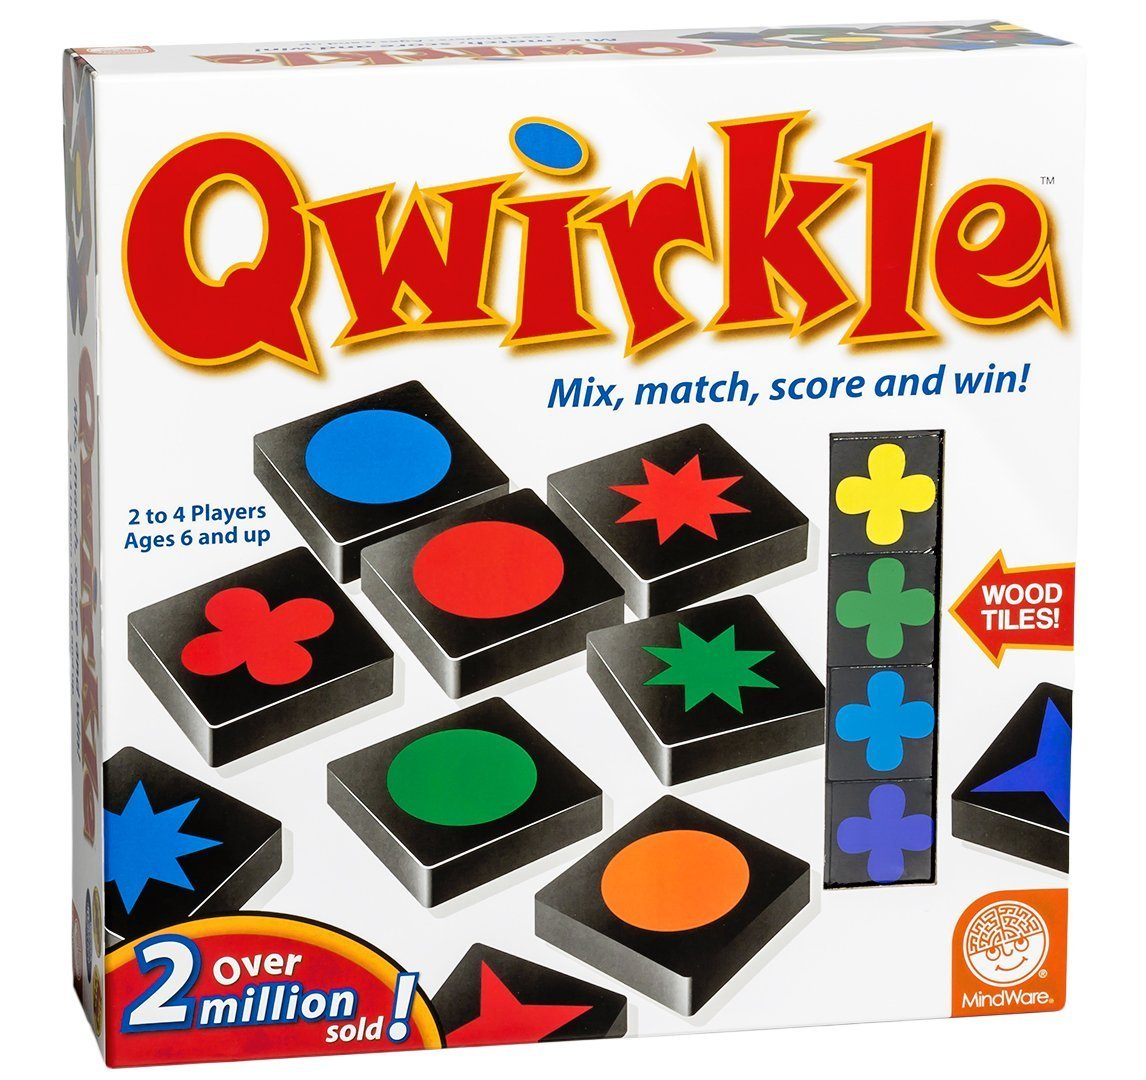 Qwirkle image